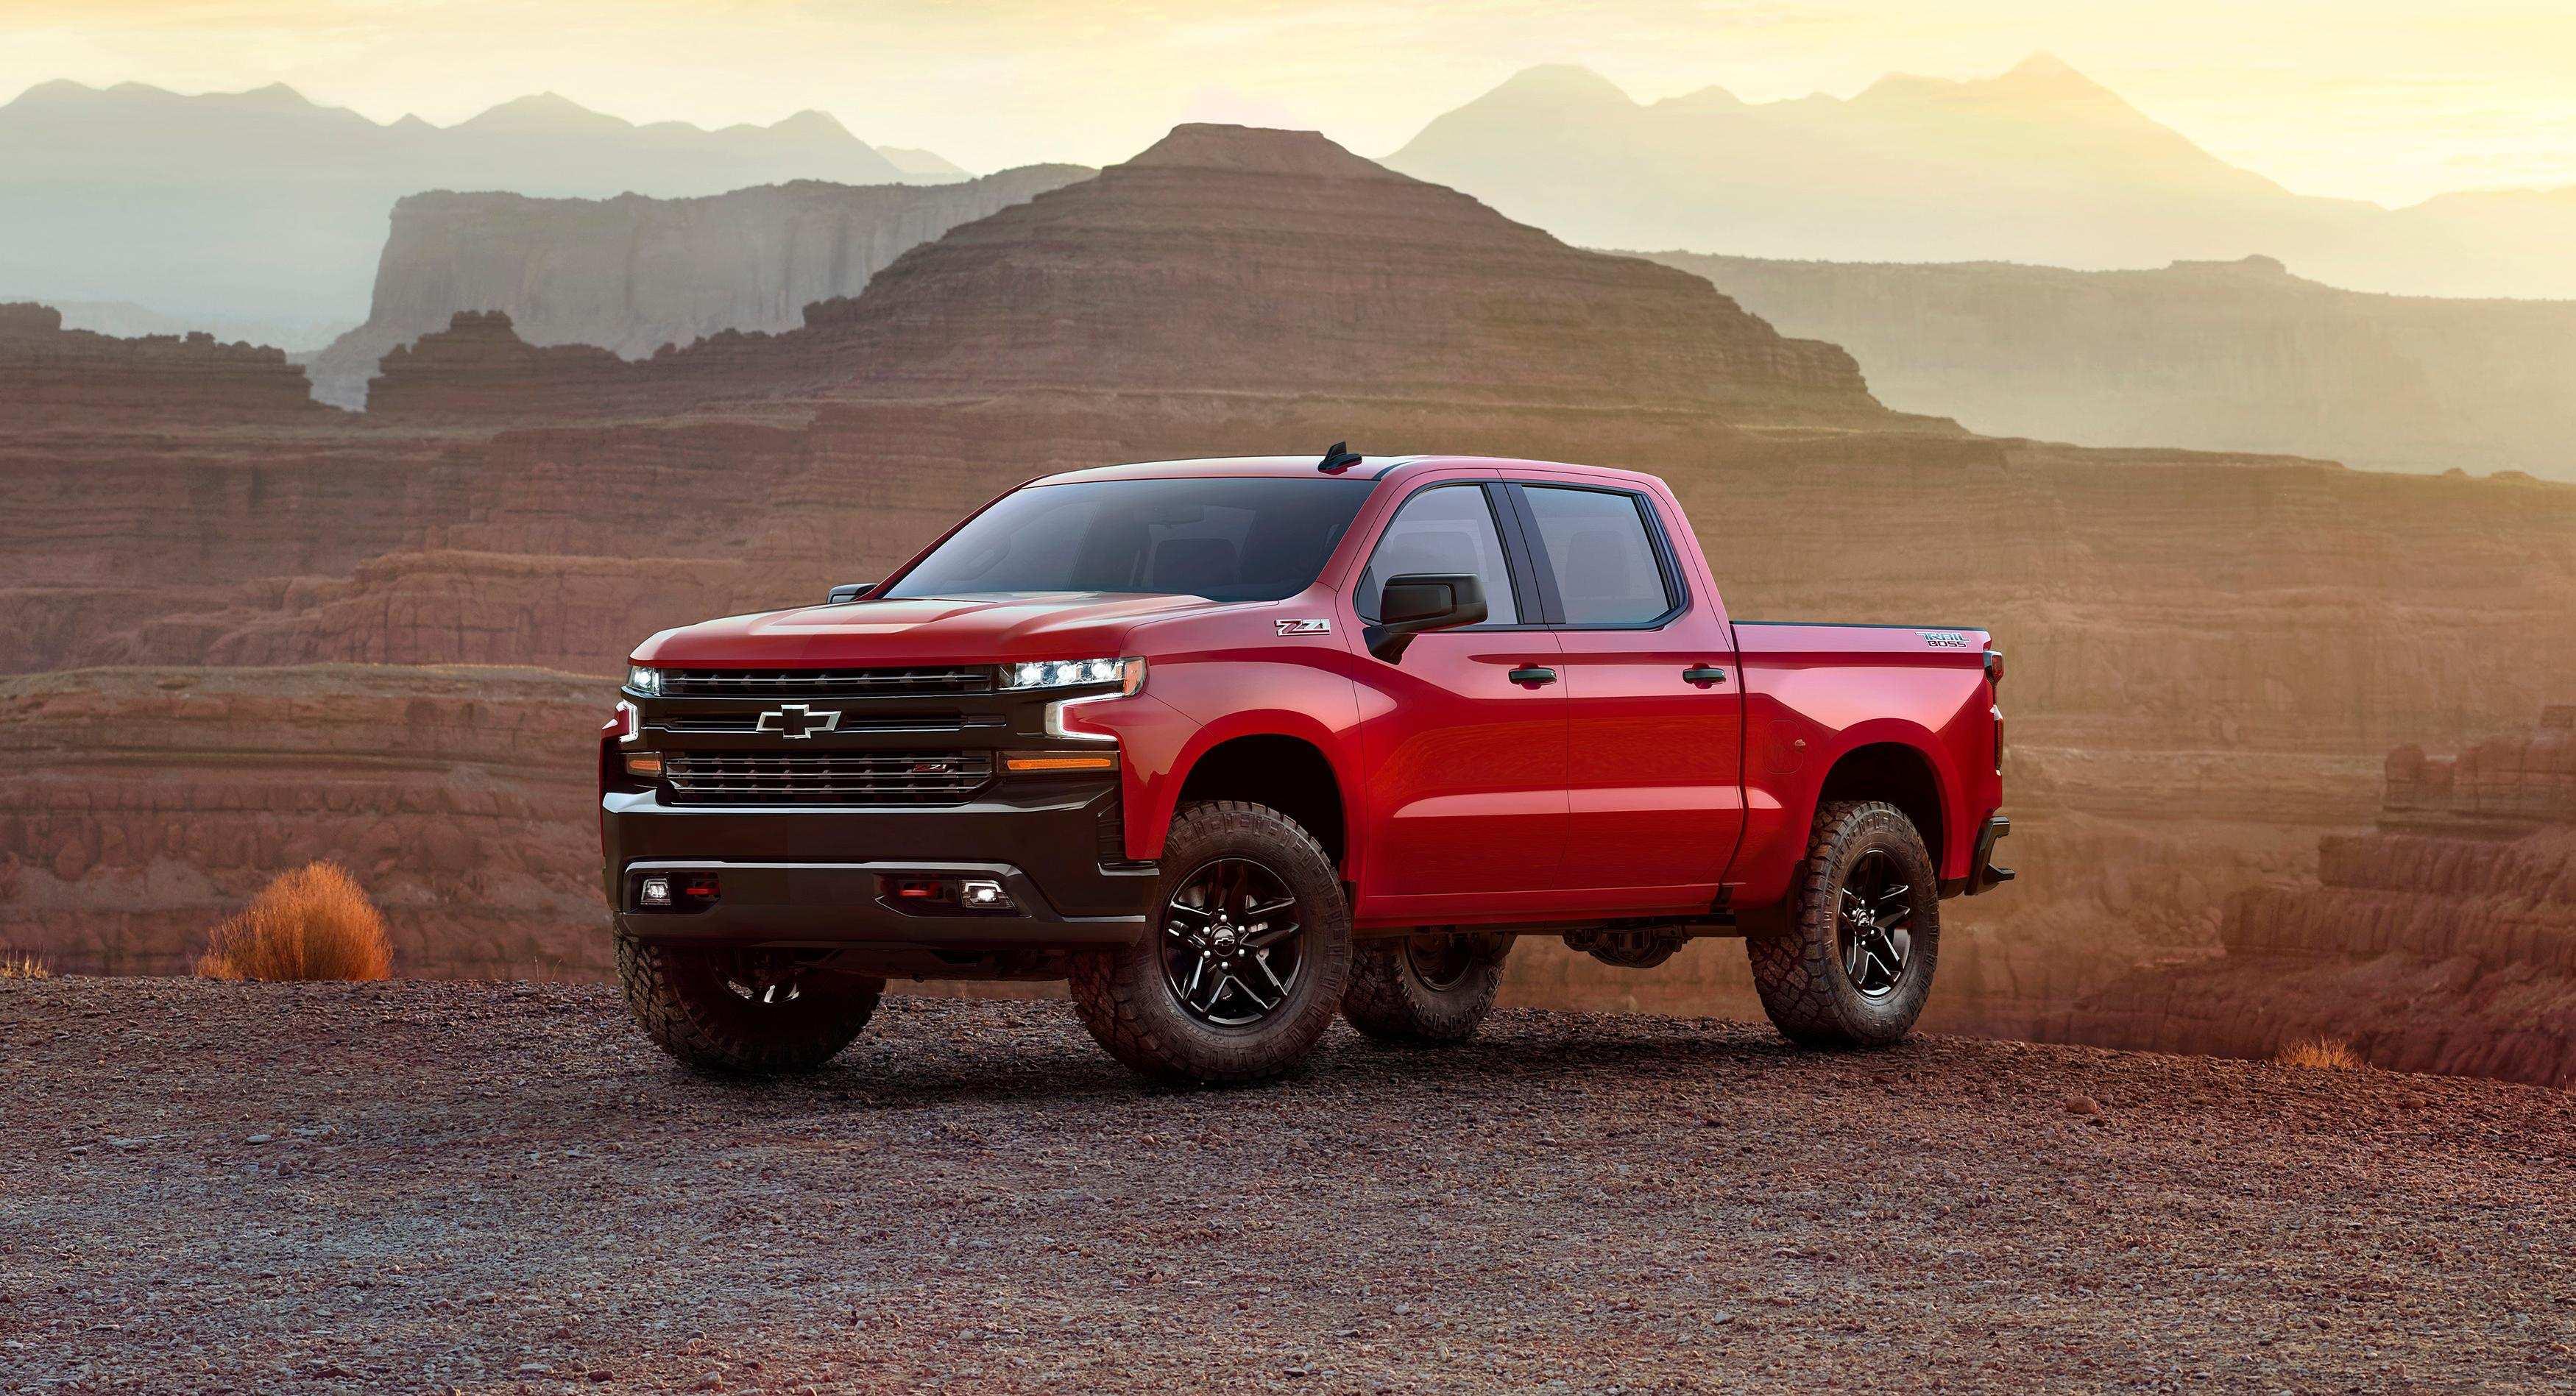 77 All New 2019 Chevrolet 3 0 Diesel Engine by 2019 Chevrolet 3 0 Diesel